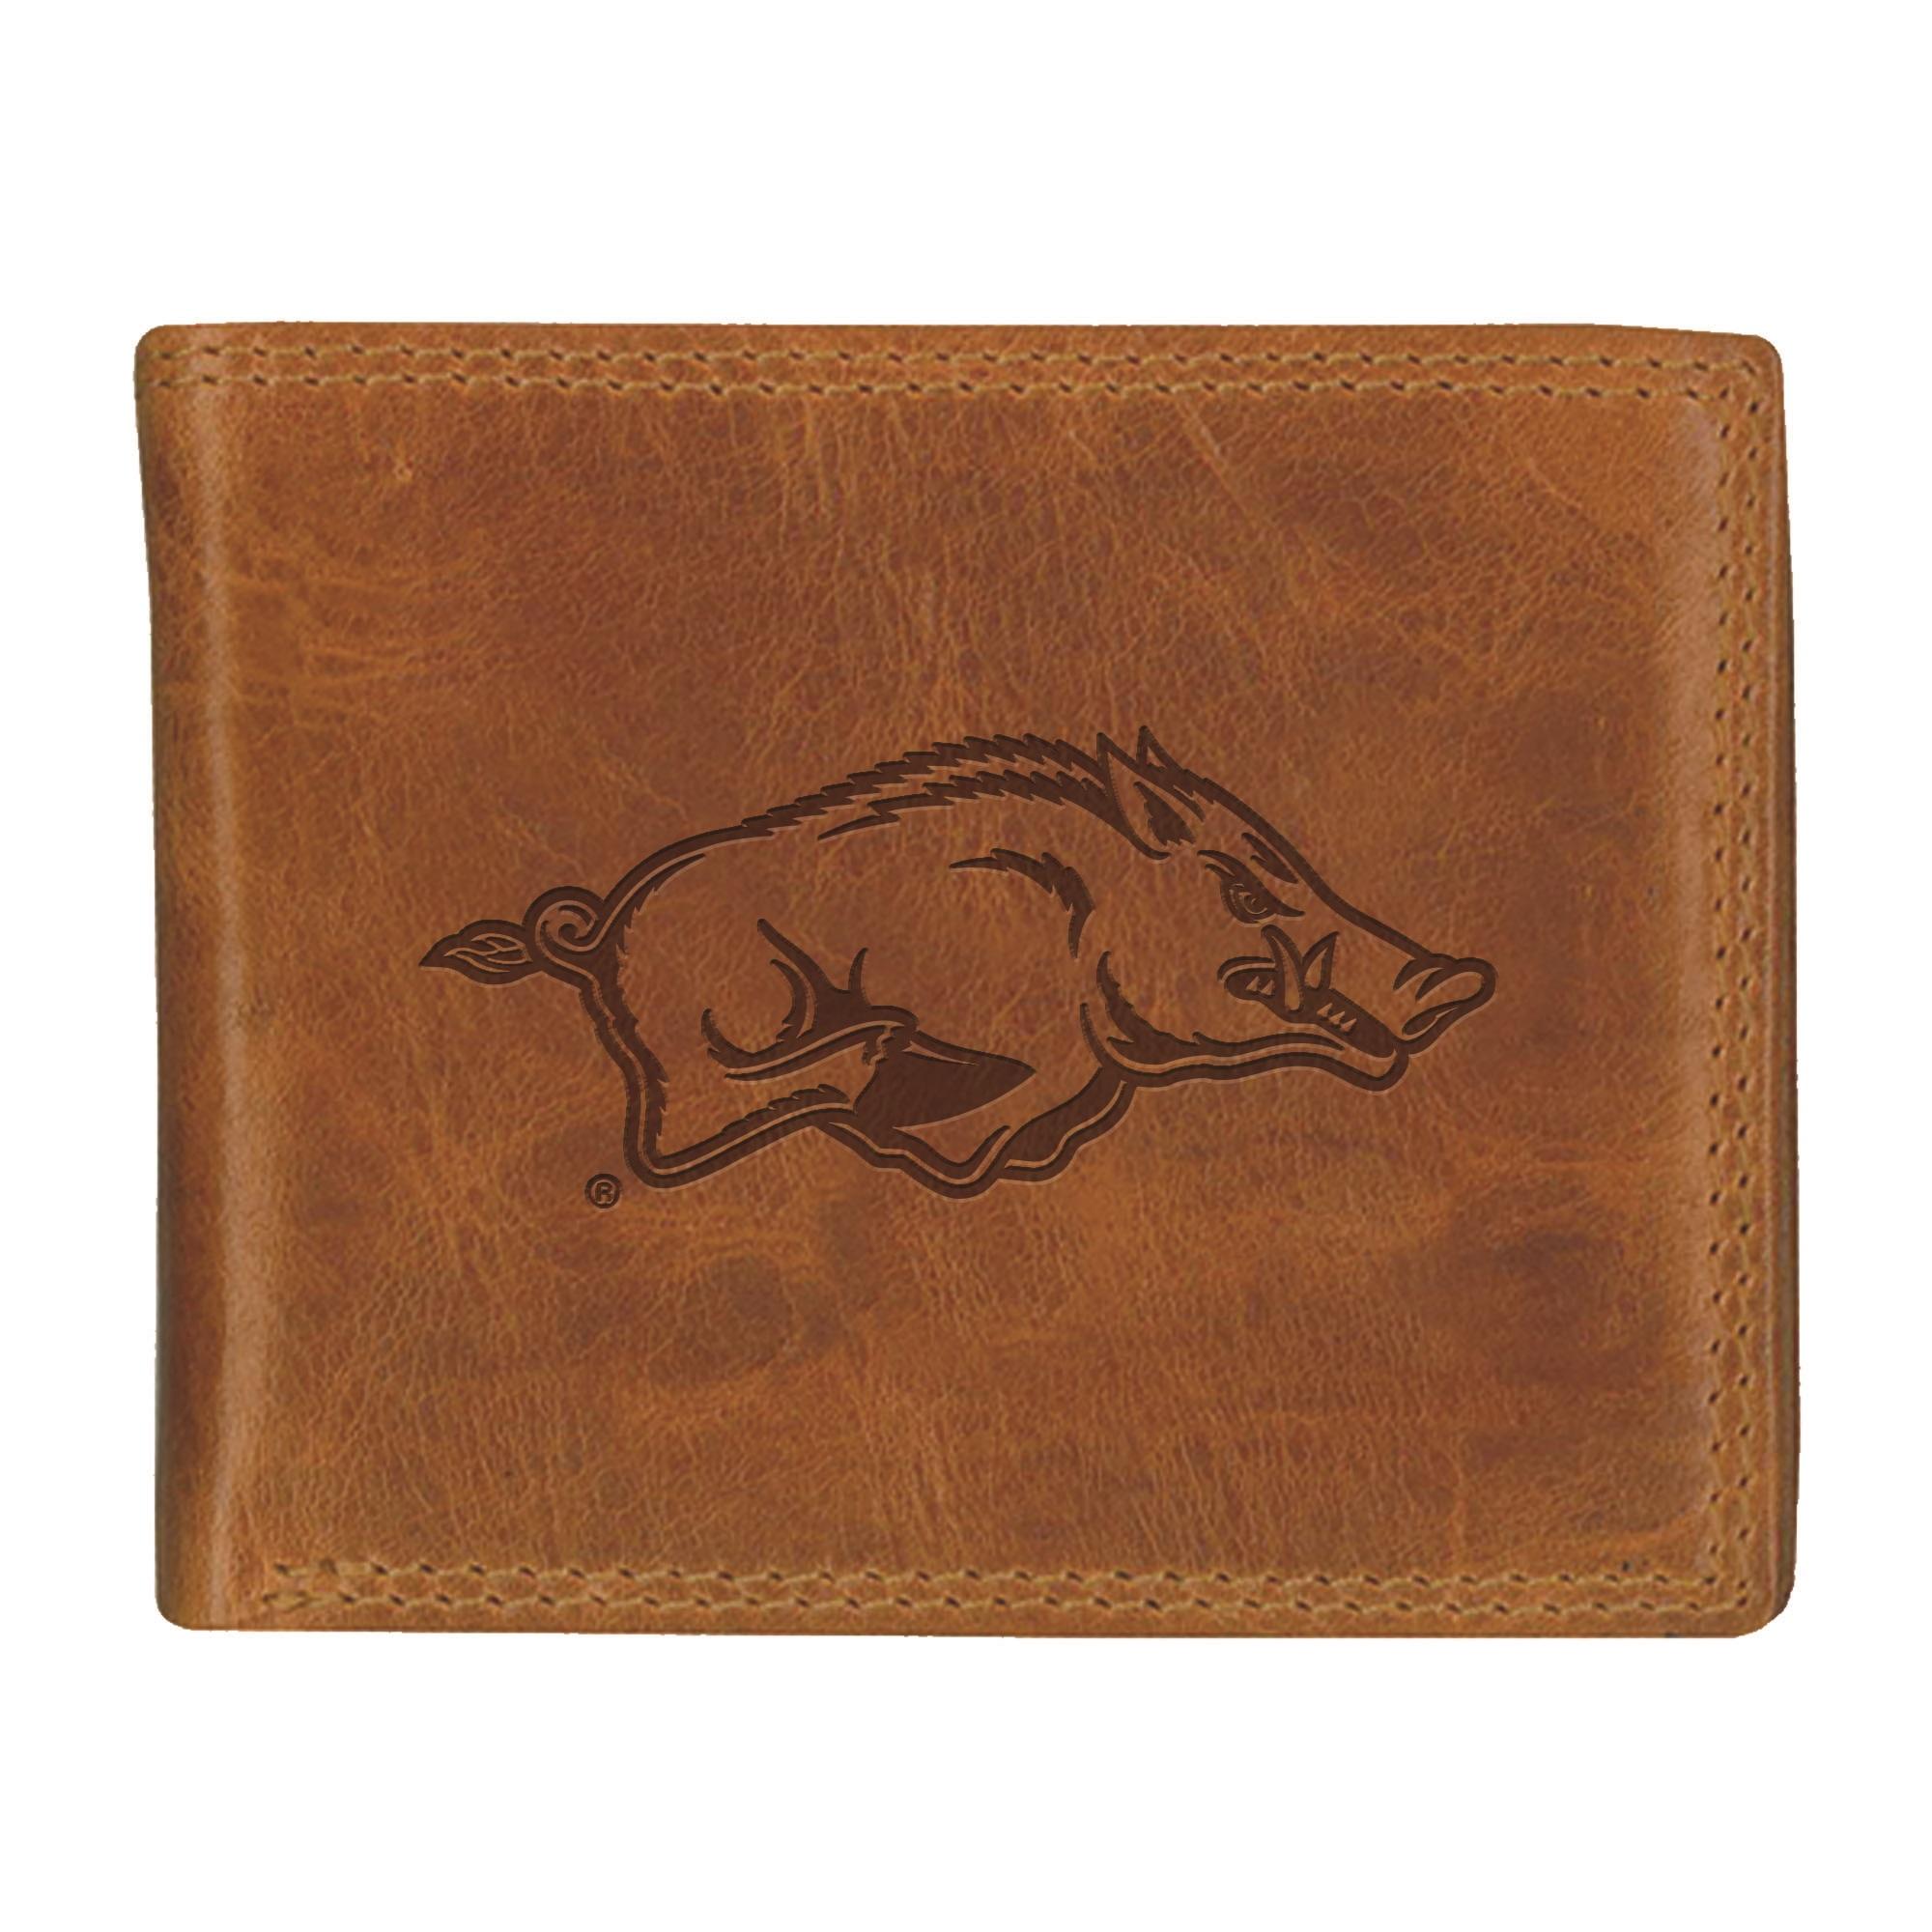 University of Arkansas Westbridge Leather Wallet